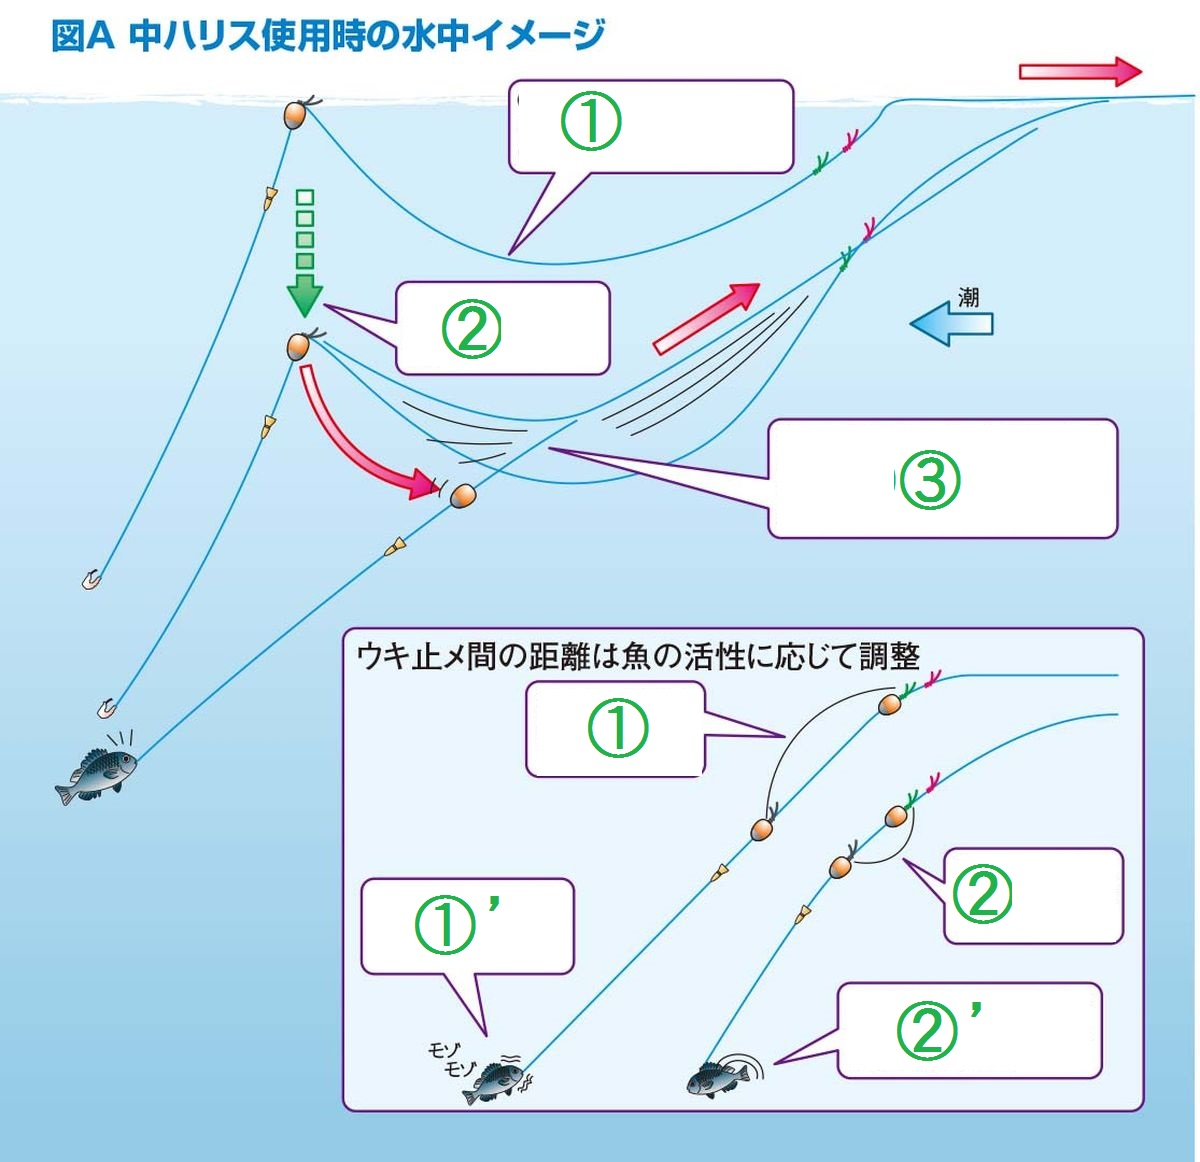 088-091tanaka-highteku_cs6 (18)